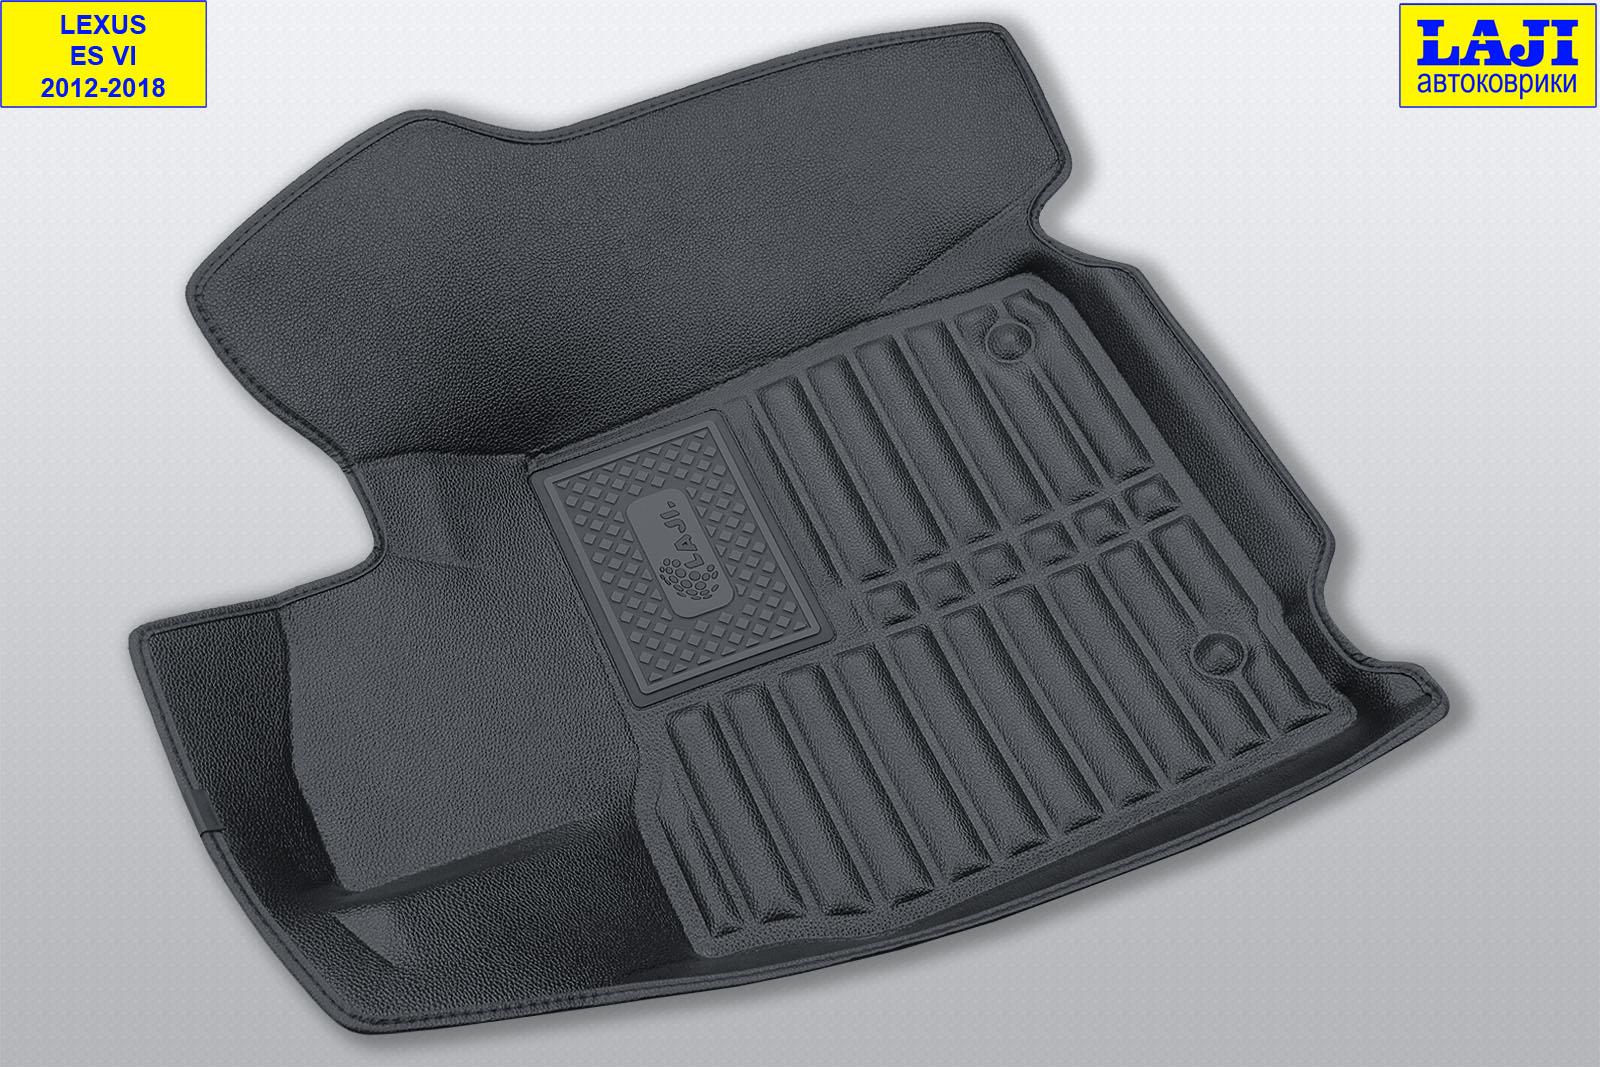 5D коврики в салон Lexus ES VI 2012-2018 3